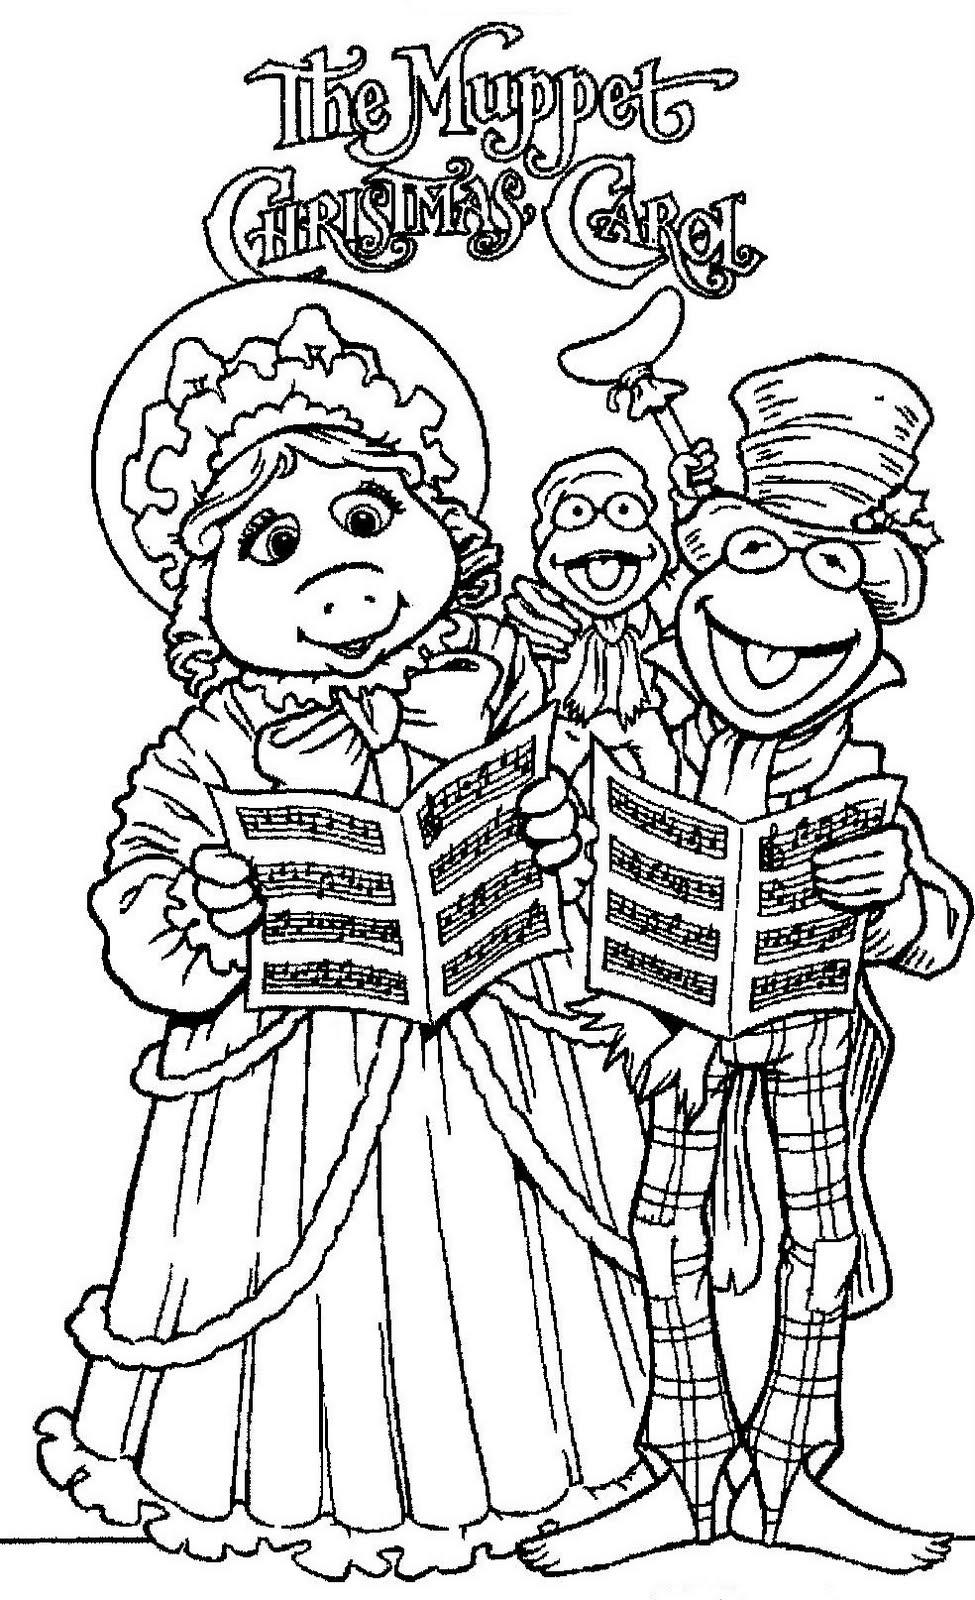 christmas carol printable coloring pages - photo#7